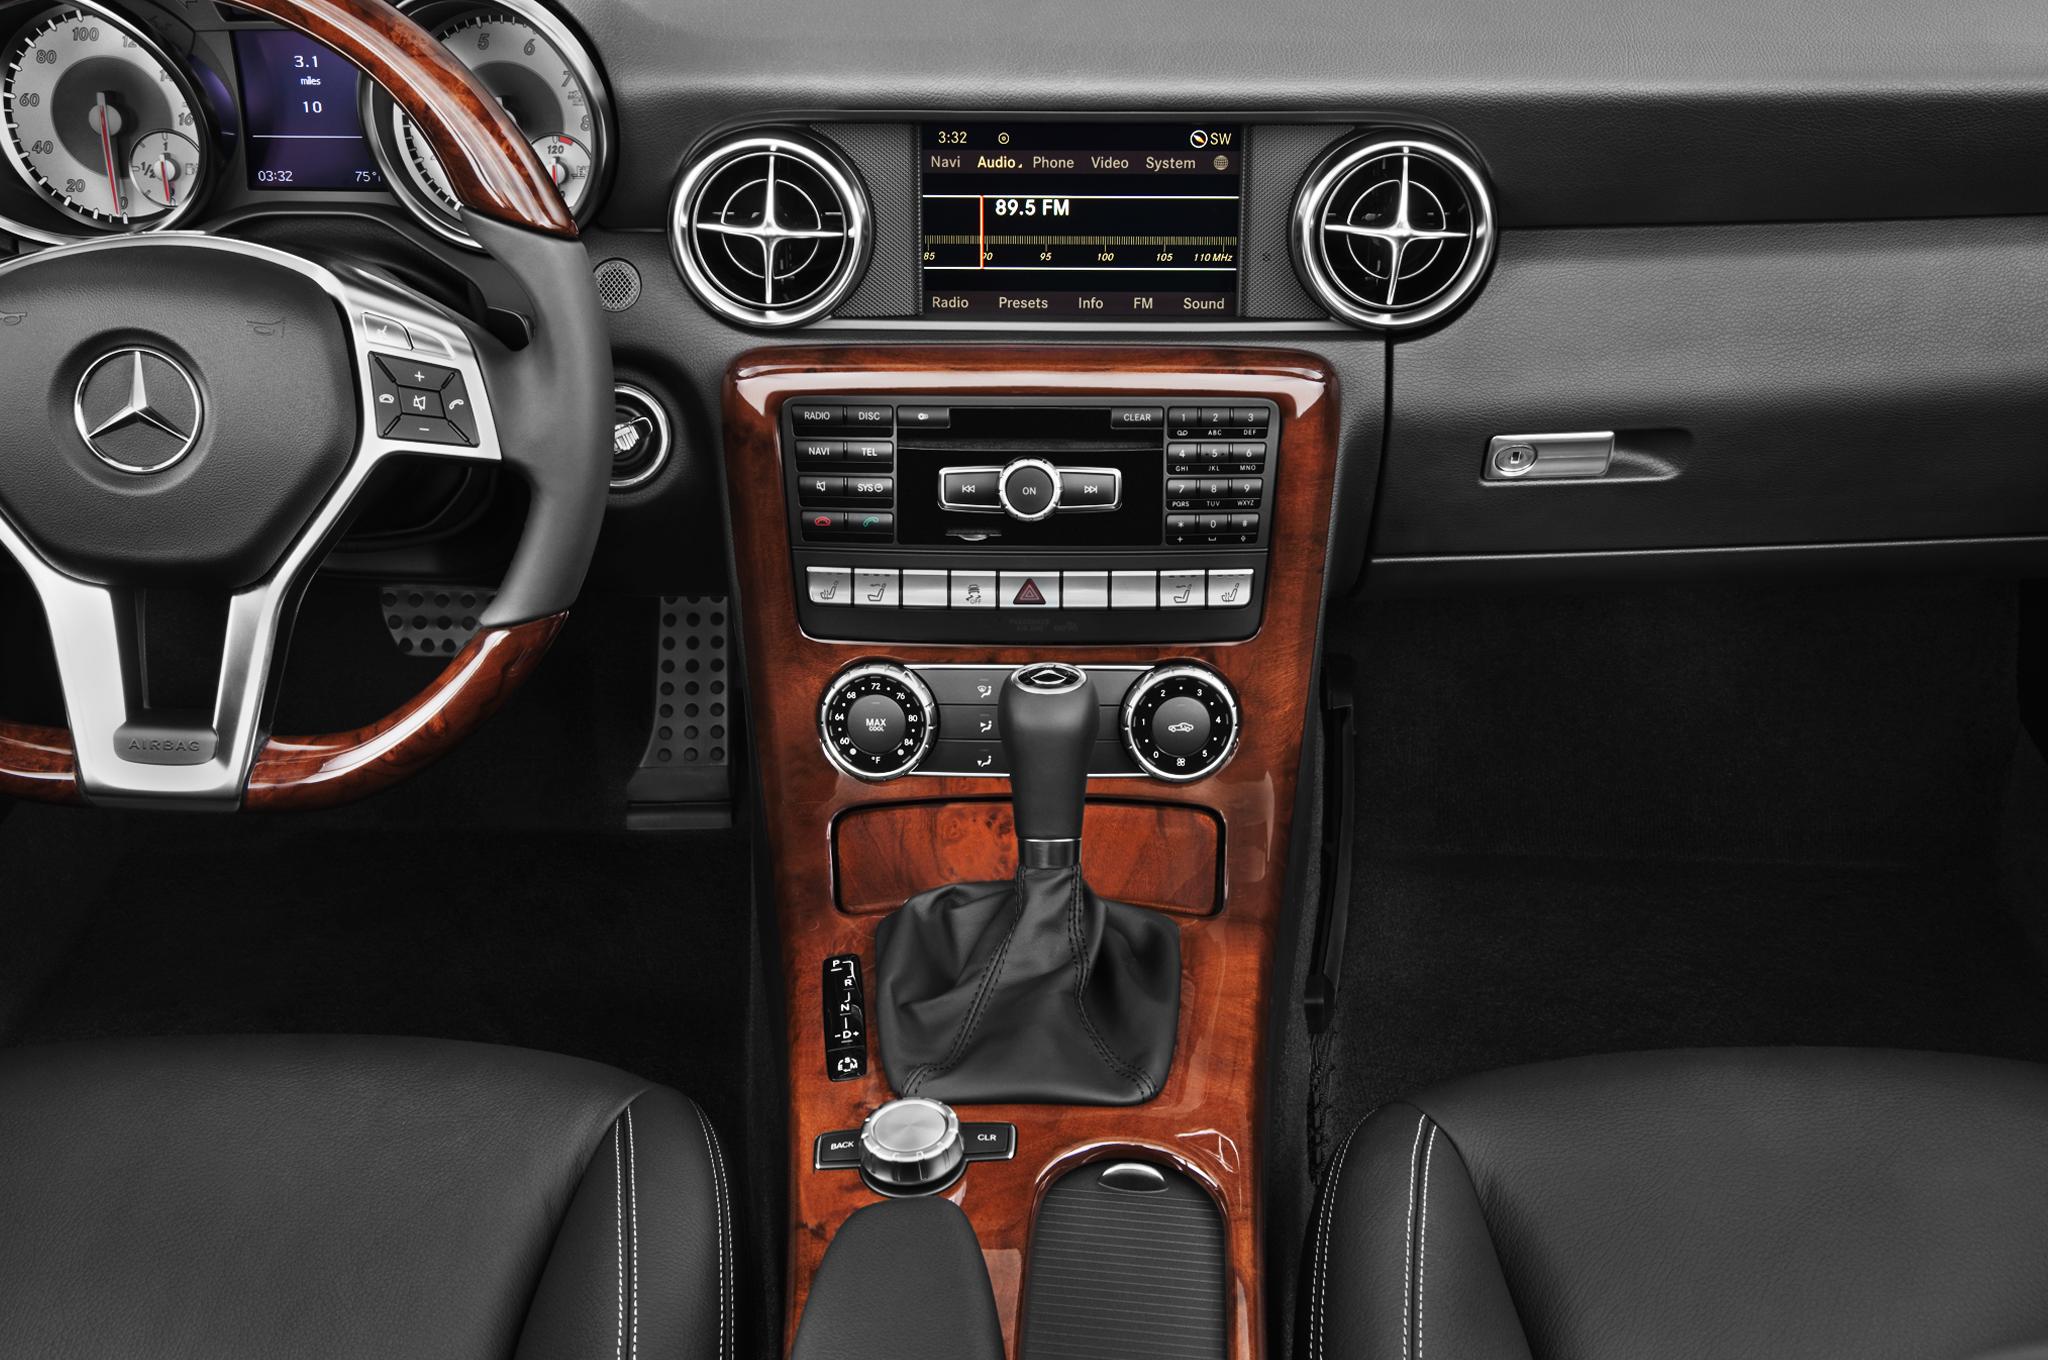 2012 Mercedes Benz Slk250 Editors Notebook Automobile Magazine October Fuse Box Diagram 15 25